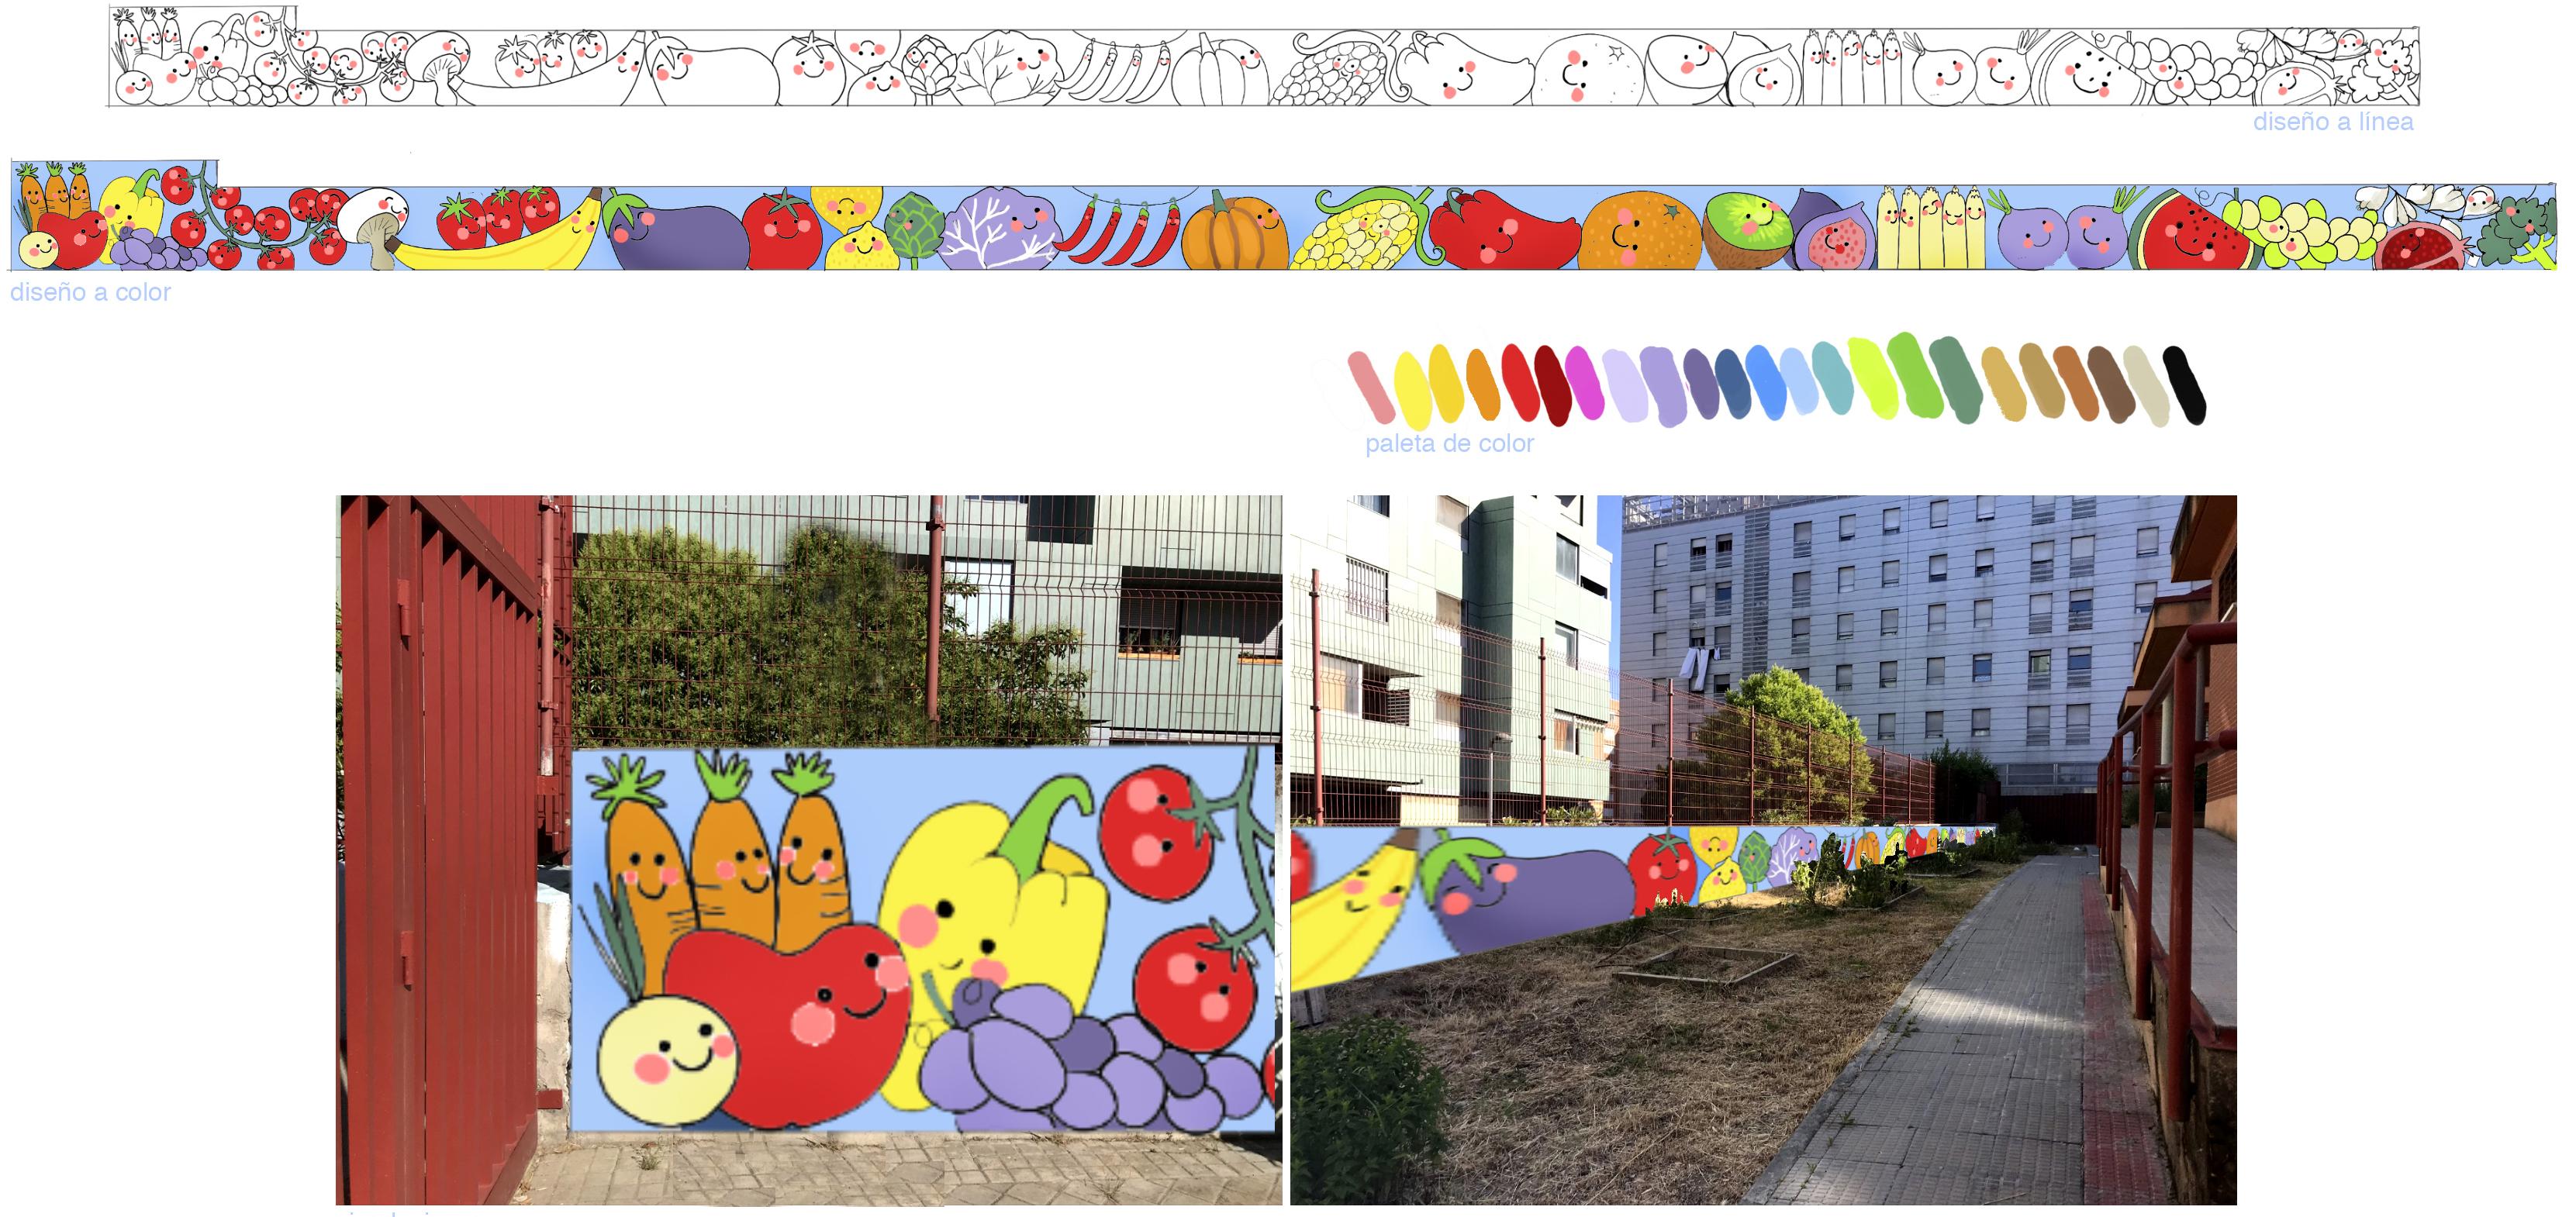 mural izas azulpatio proyecto eduardo rojo huerto